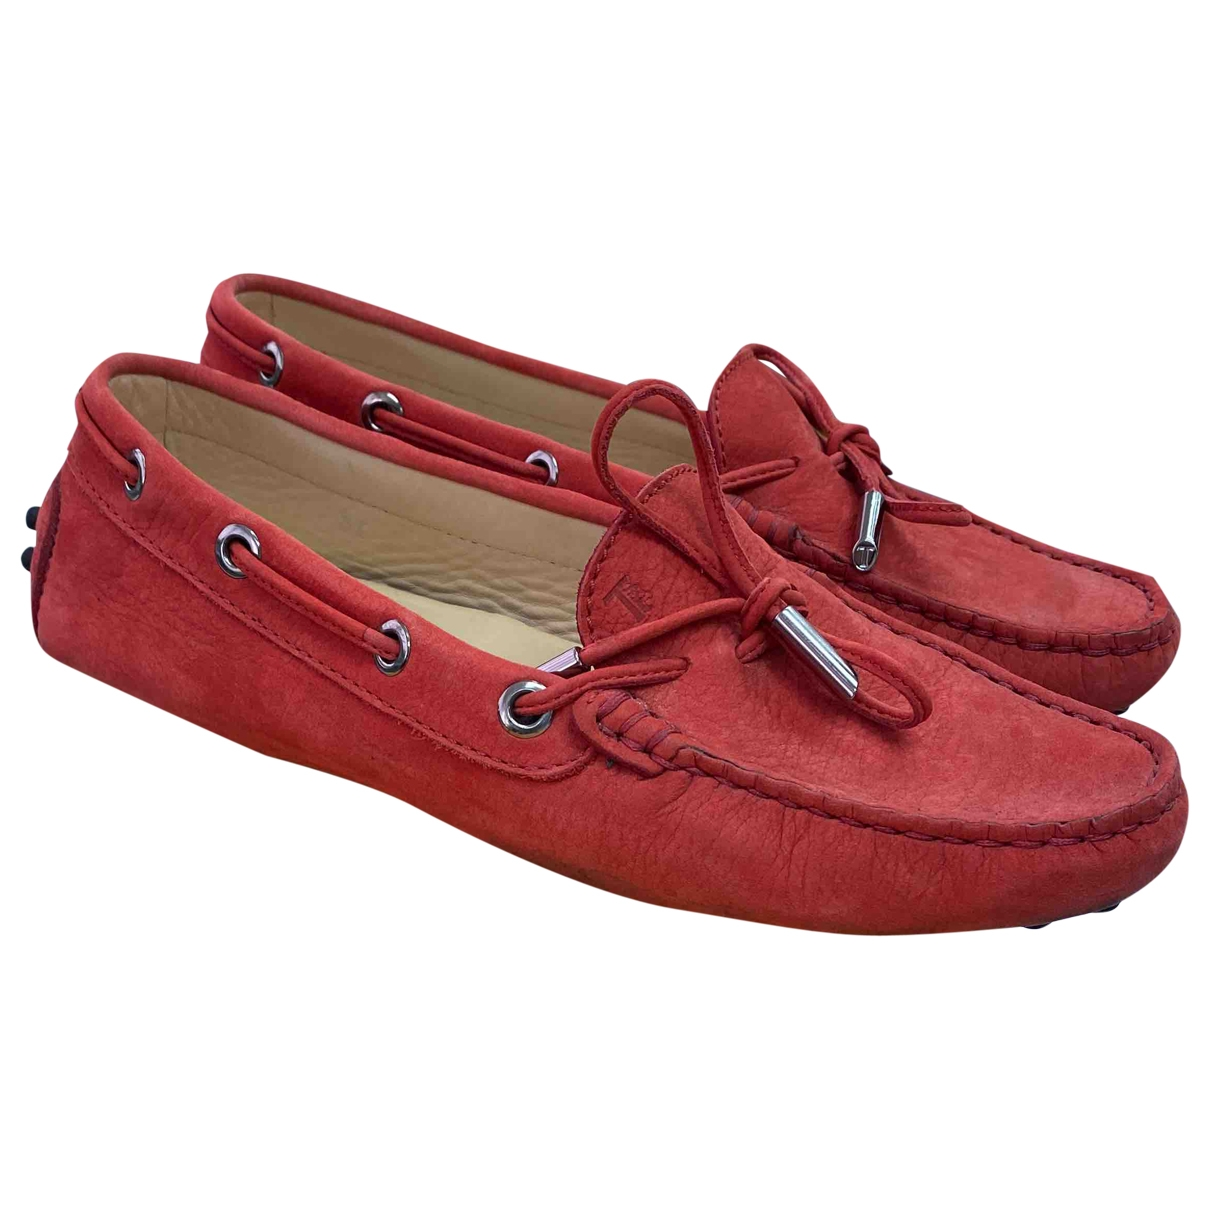 Tod's \N Orange Leather Flats for Women 35 EU